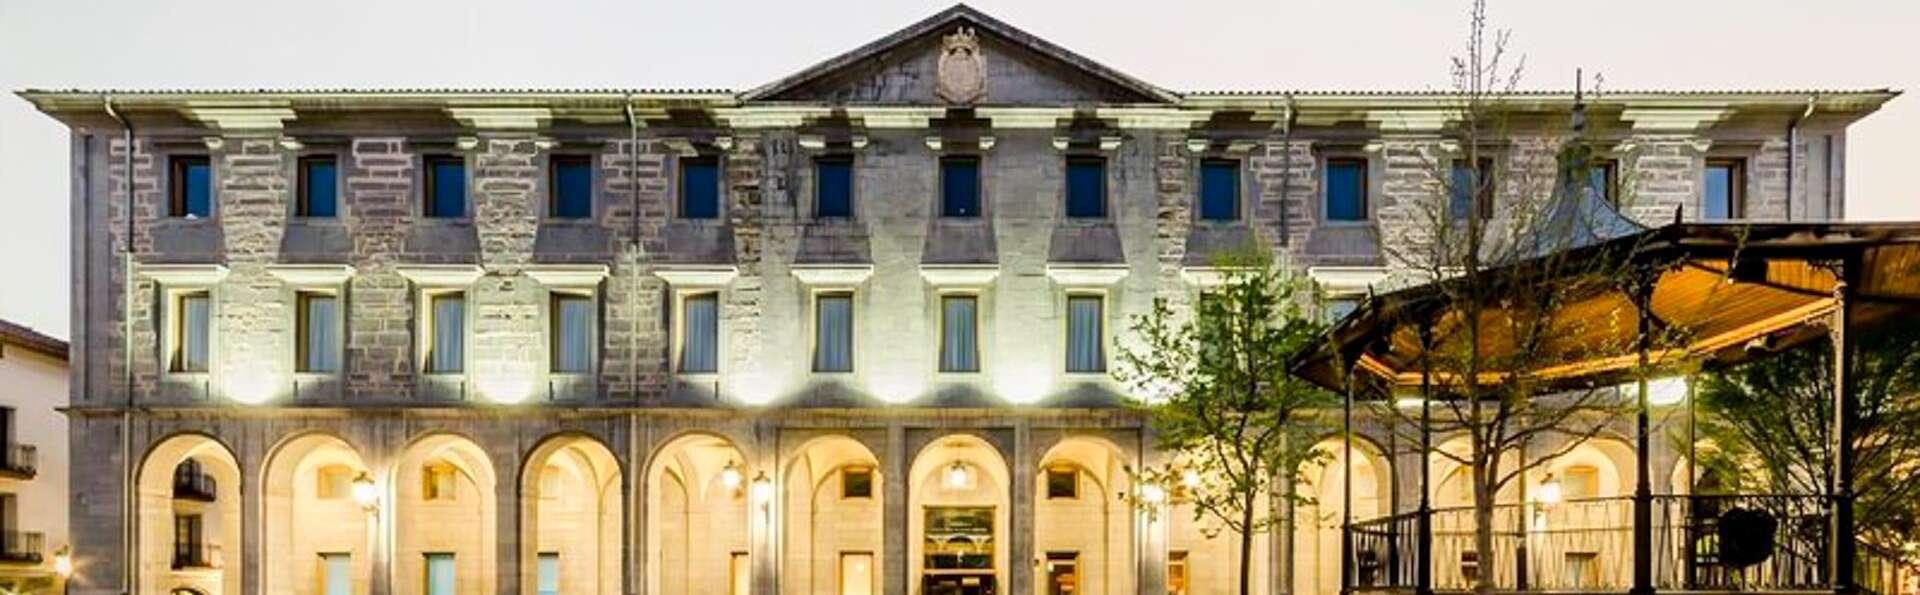 Hotel Balneario Orduña Plaza - EDIT_NEW_FRONT_01.jpg